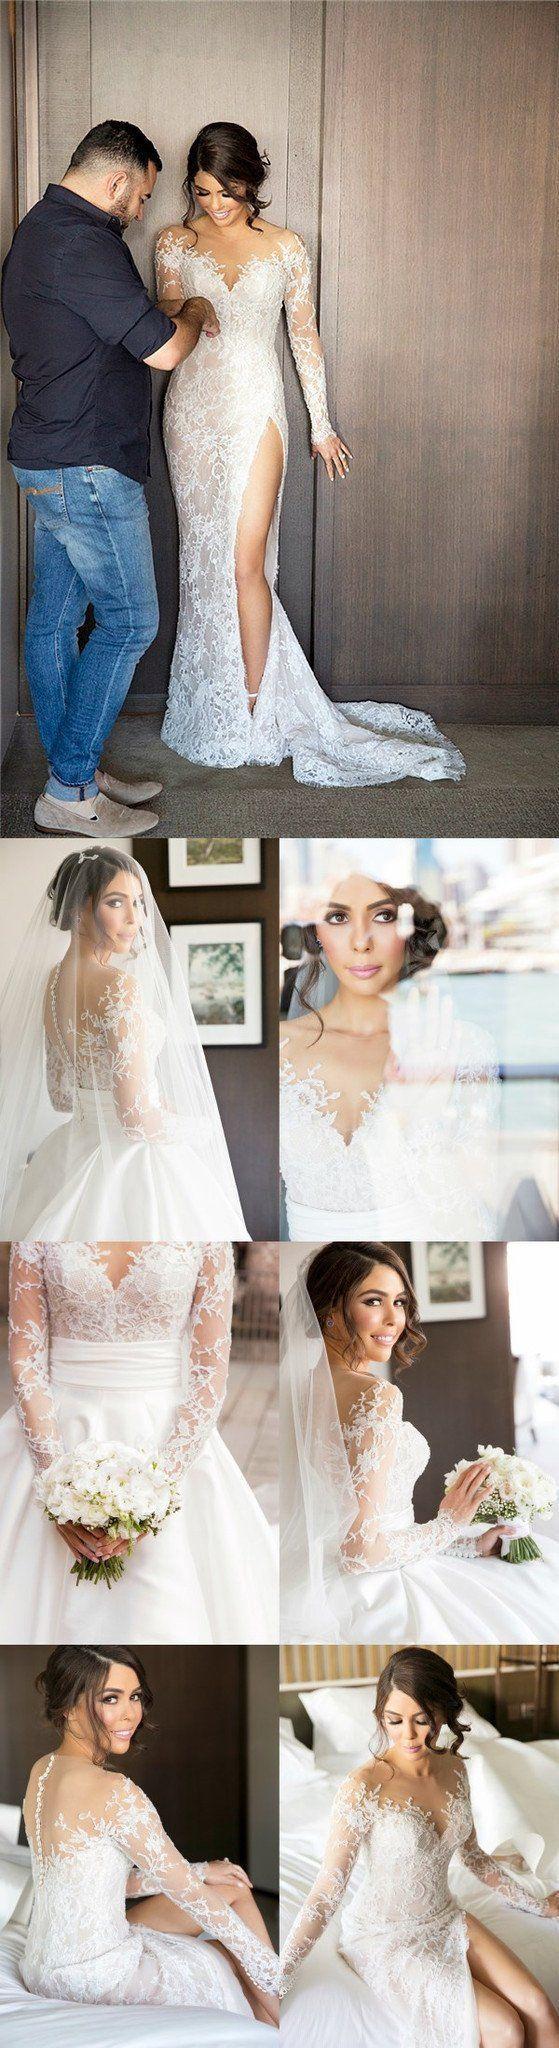 2019 New Full Lace Split Wedding Dresses with Detachable Satin Skirt